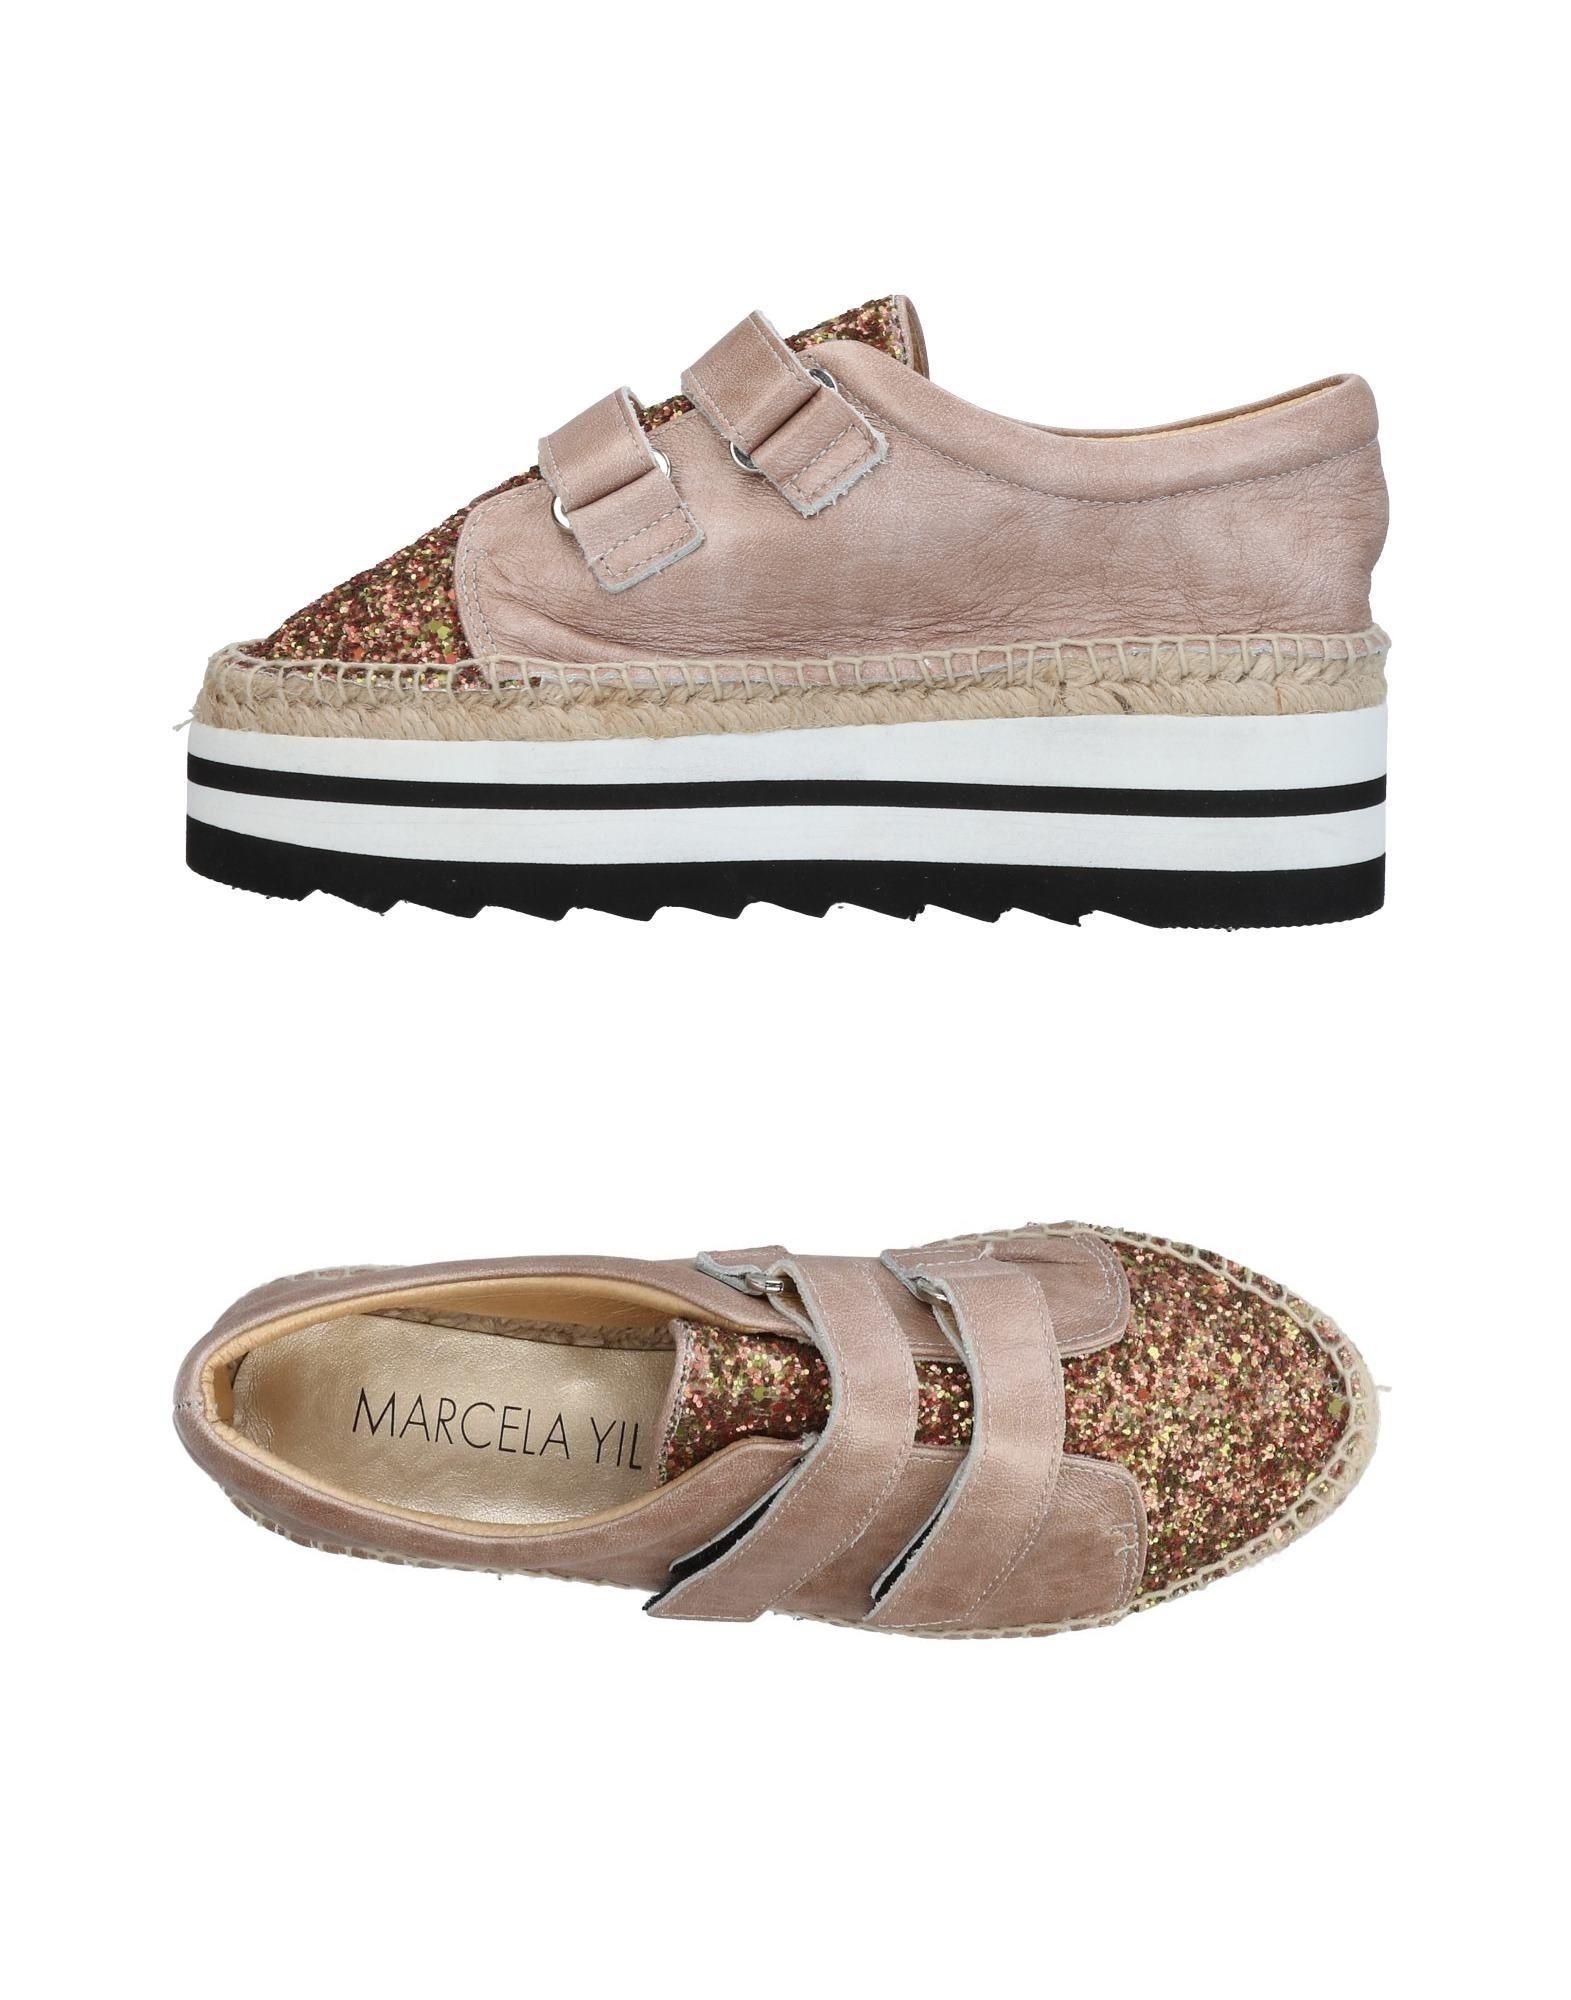 Marcela Yil Bas-tops Et Chaussures De Sport xQopRFZQNe